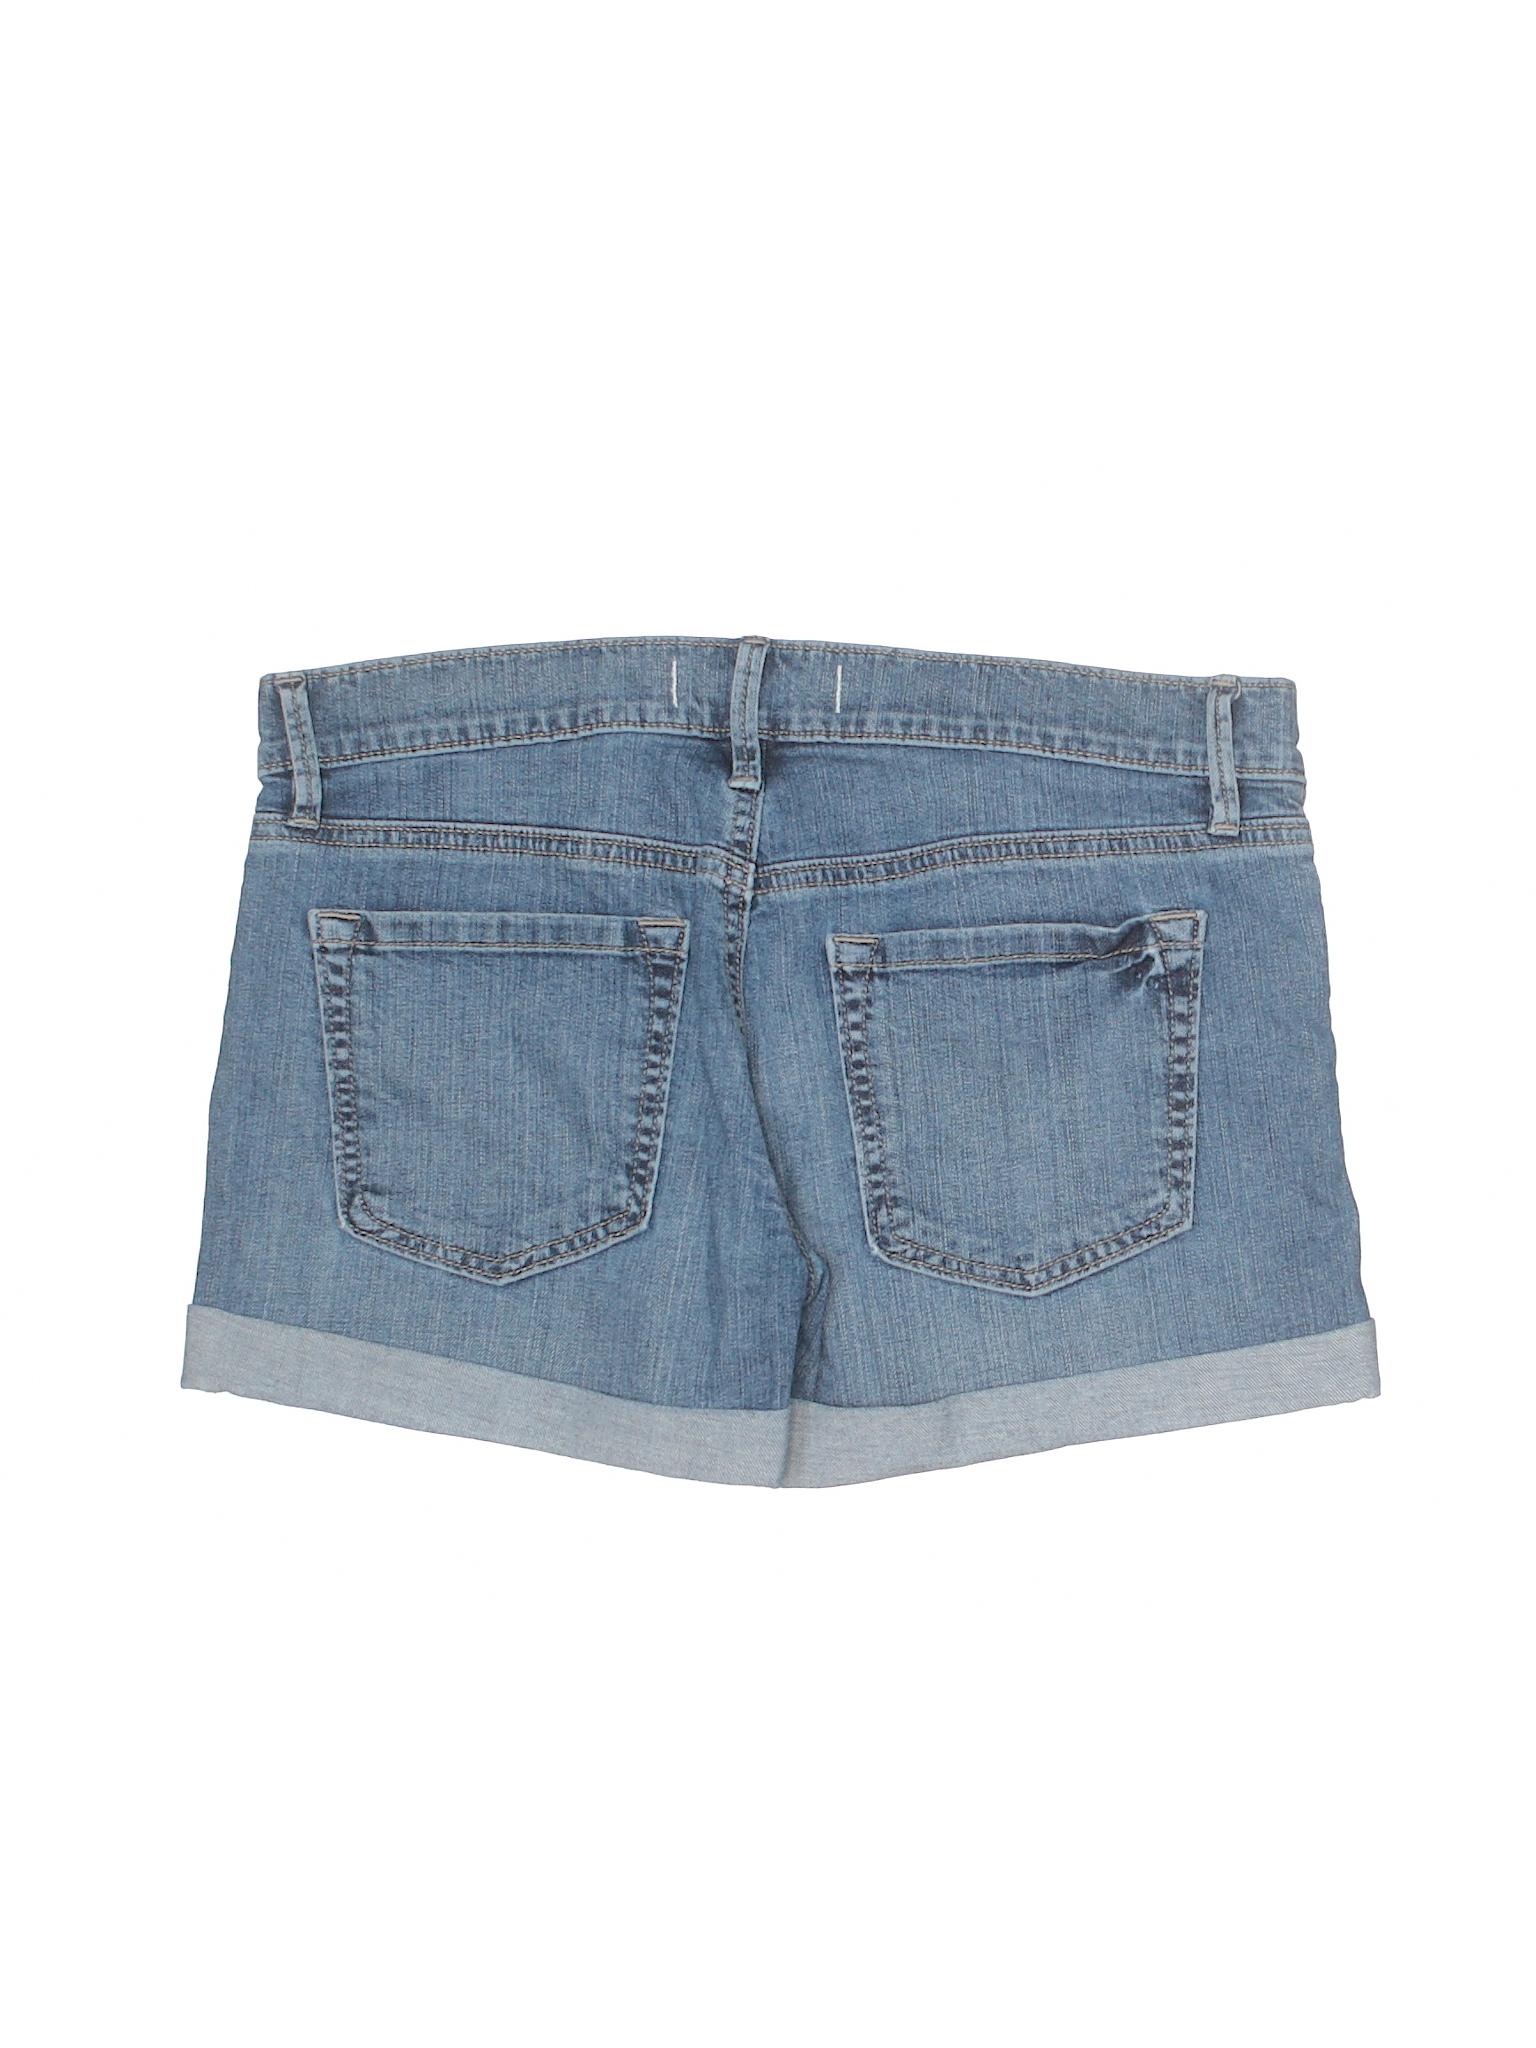 Denim Taylor Ann LOFT Shorts Boutique Aqt4U